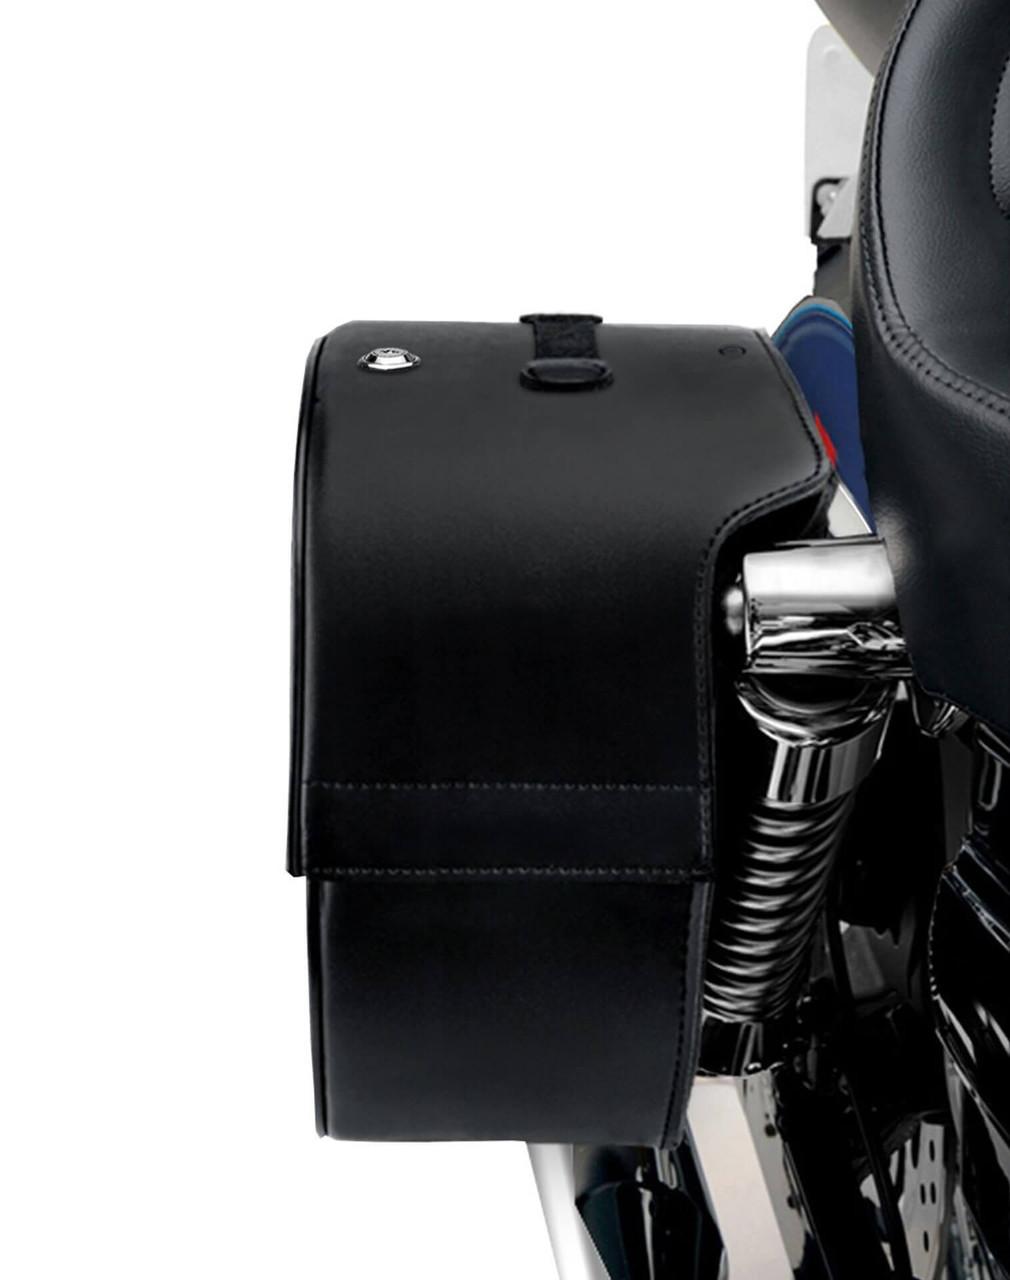 Kawasaki Eliminator 125 Shock Cut Out Studded Large Motorcycle Saddlebags Shock Cutout View